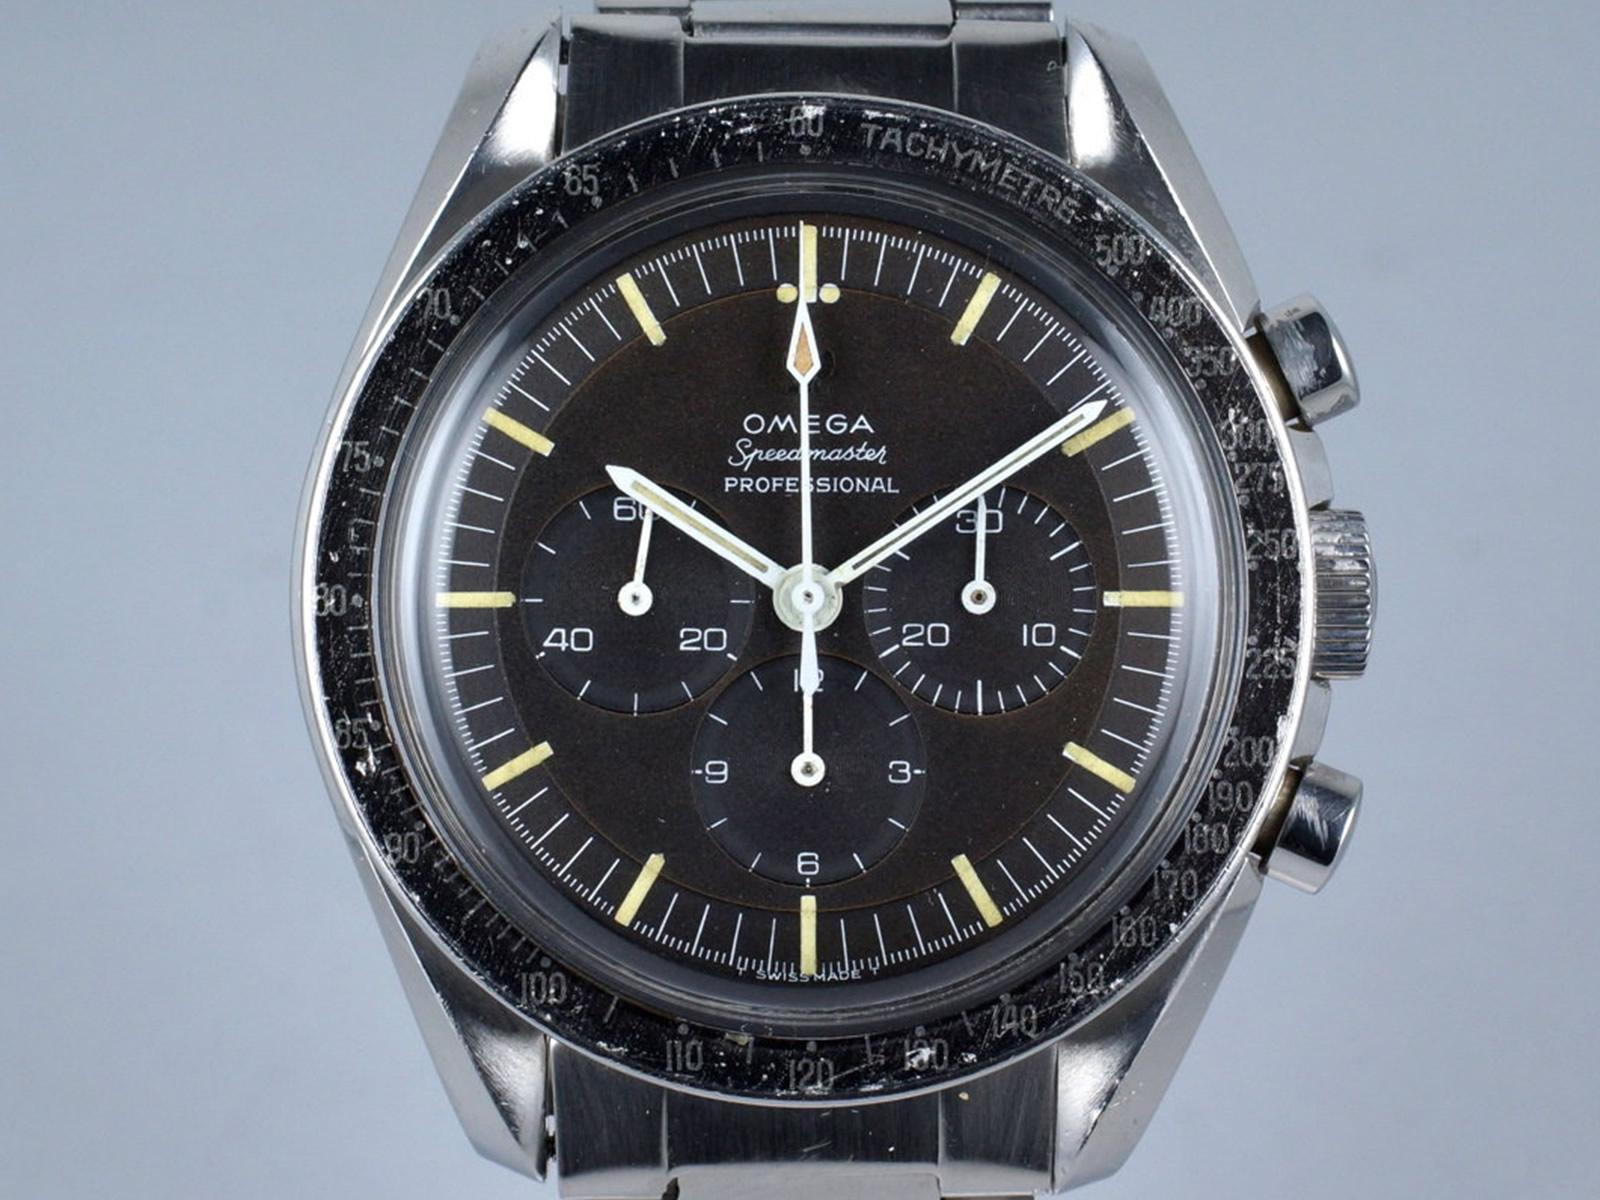 omega-speedmaster-105-003-.jpg